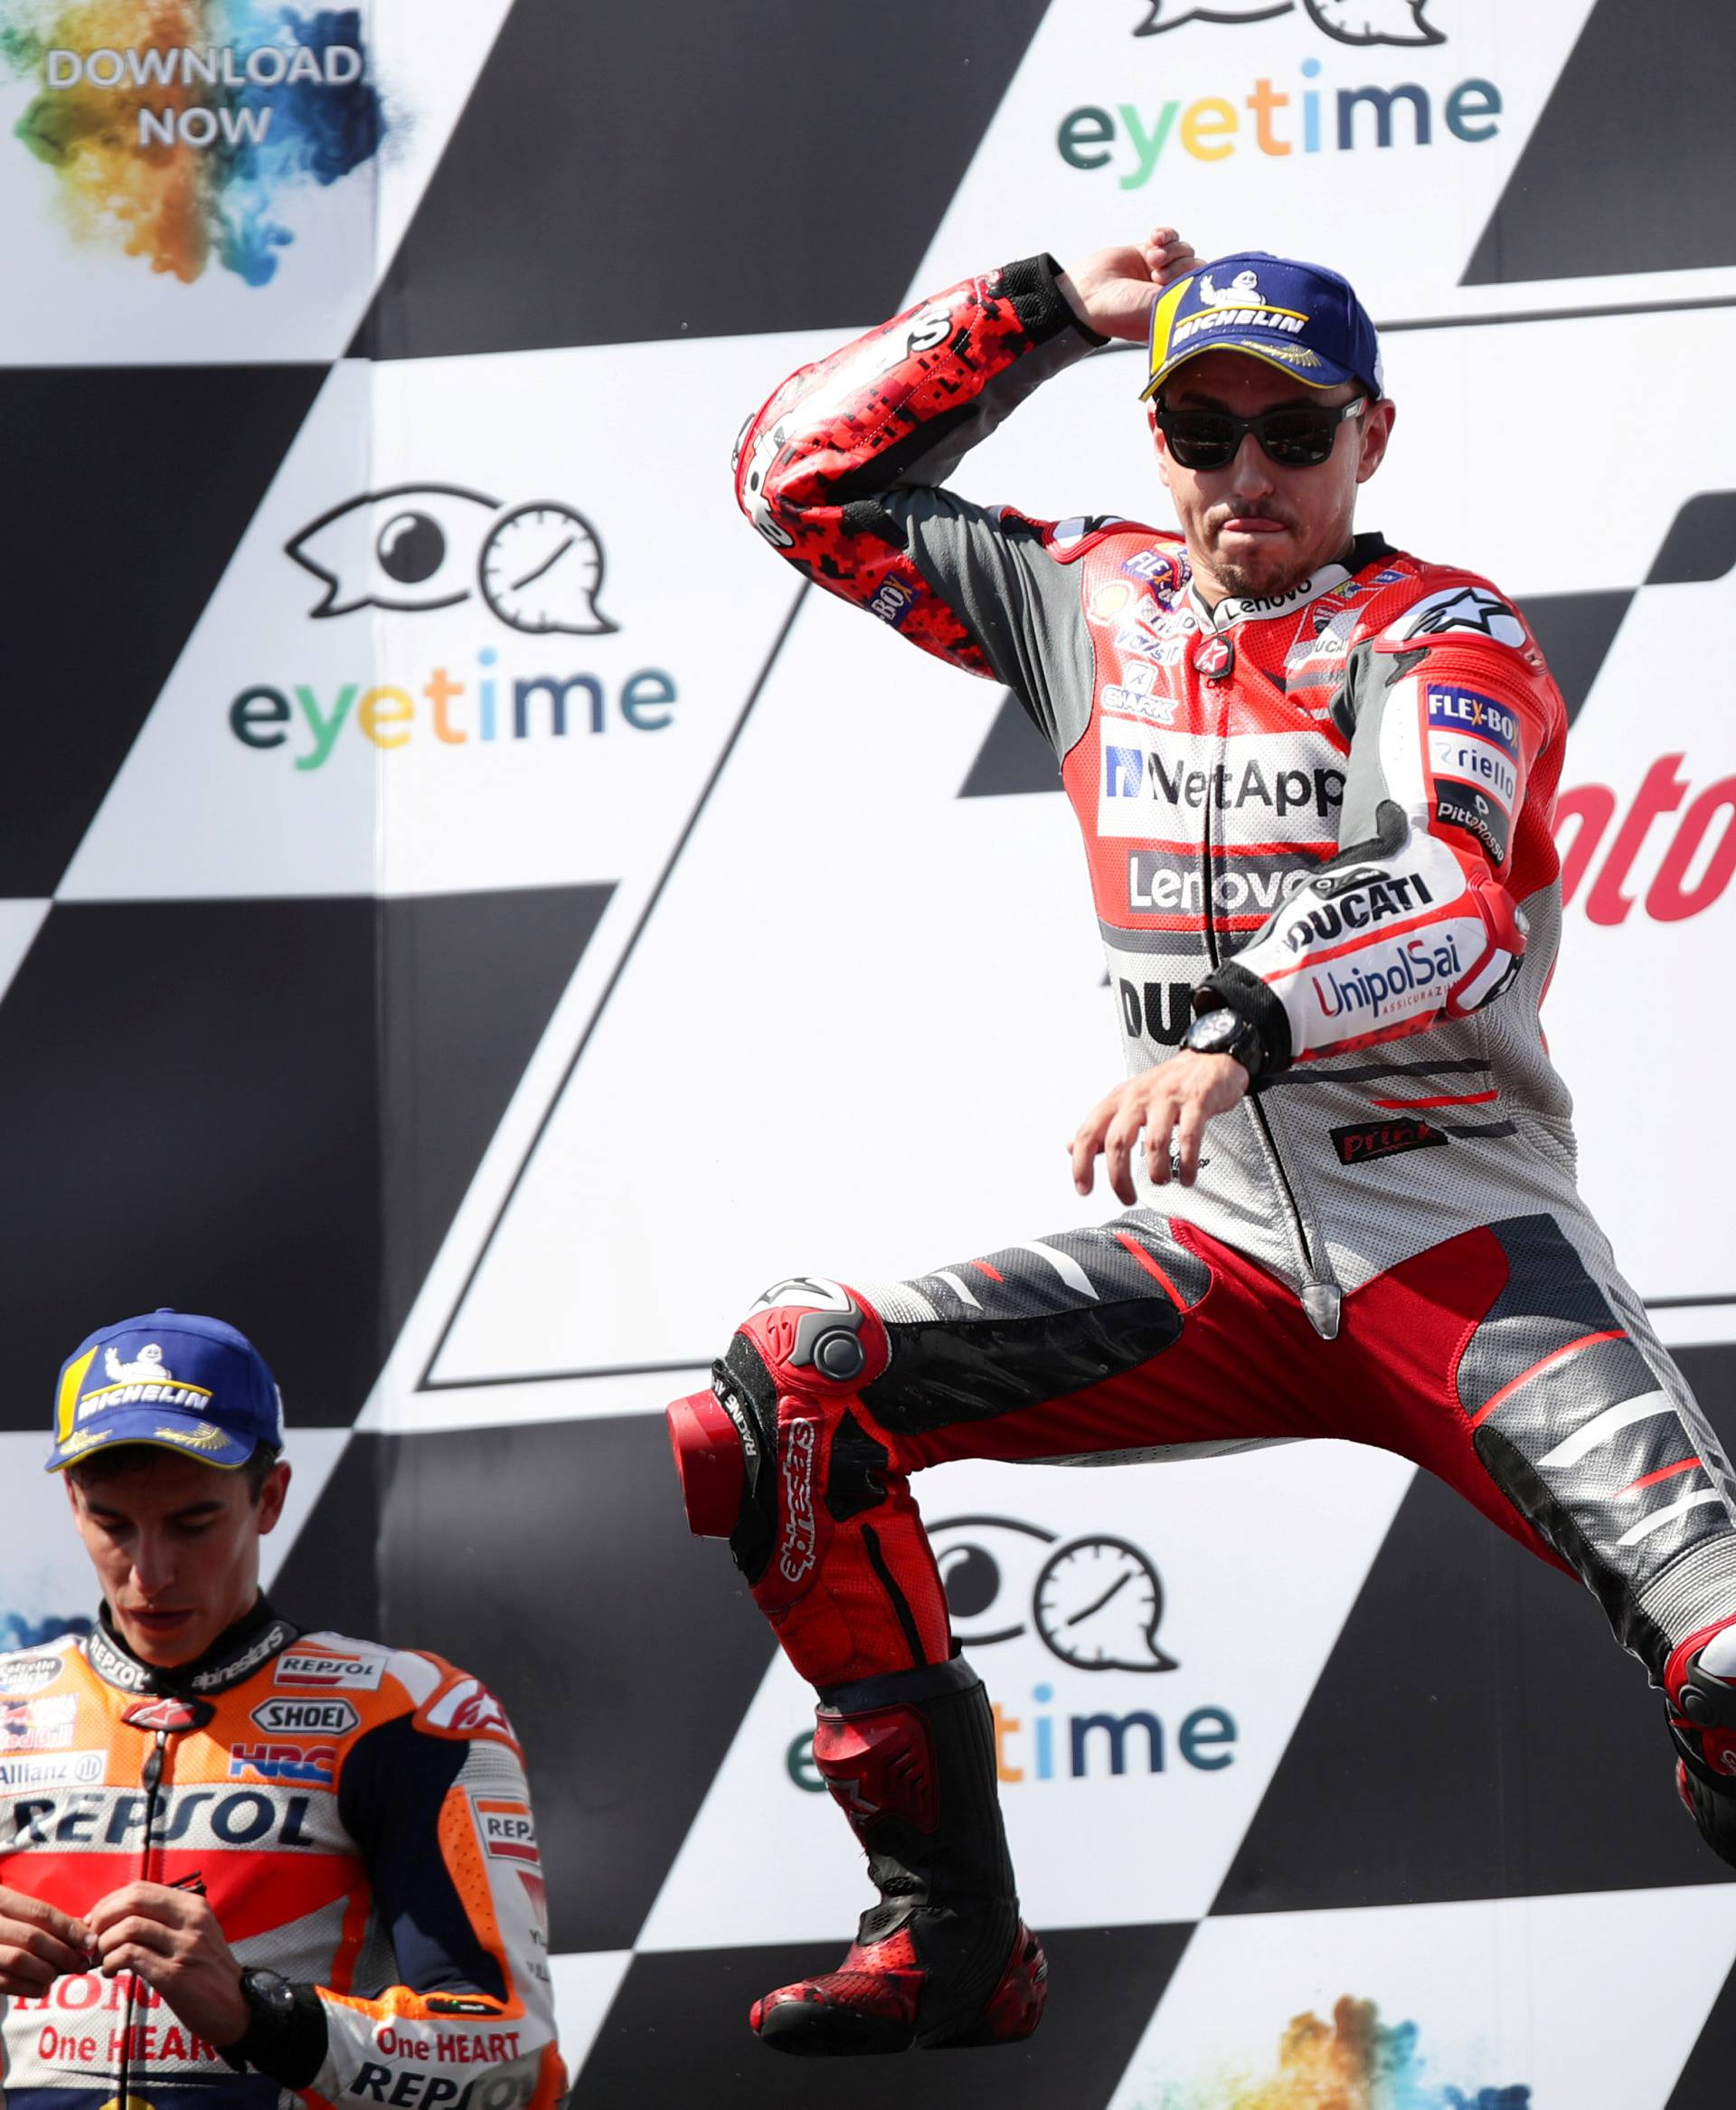 MotoGP - Austrian Grand Prix